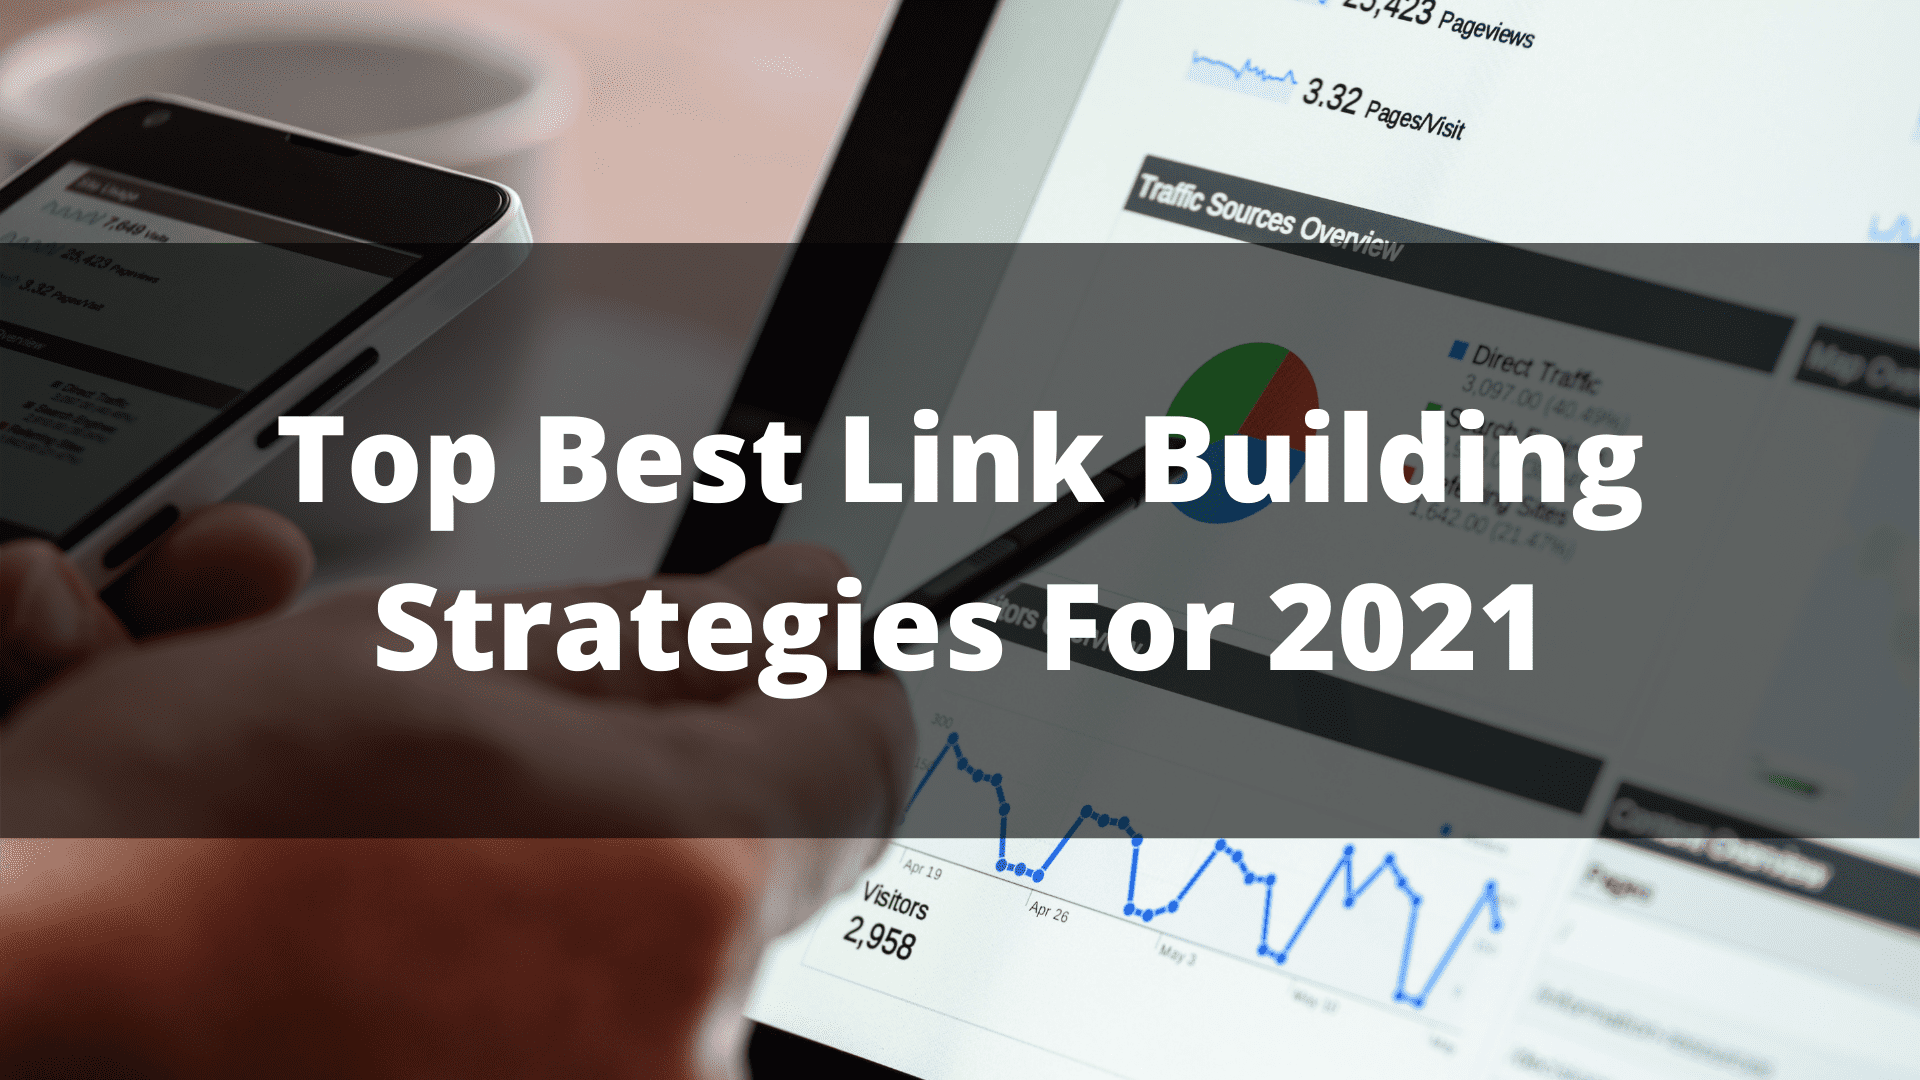 Top Best Link Building Strategies For 2021